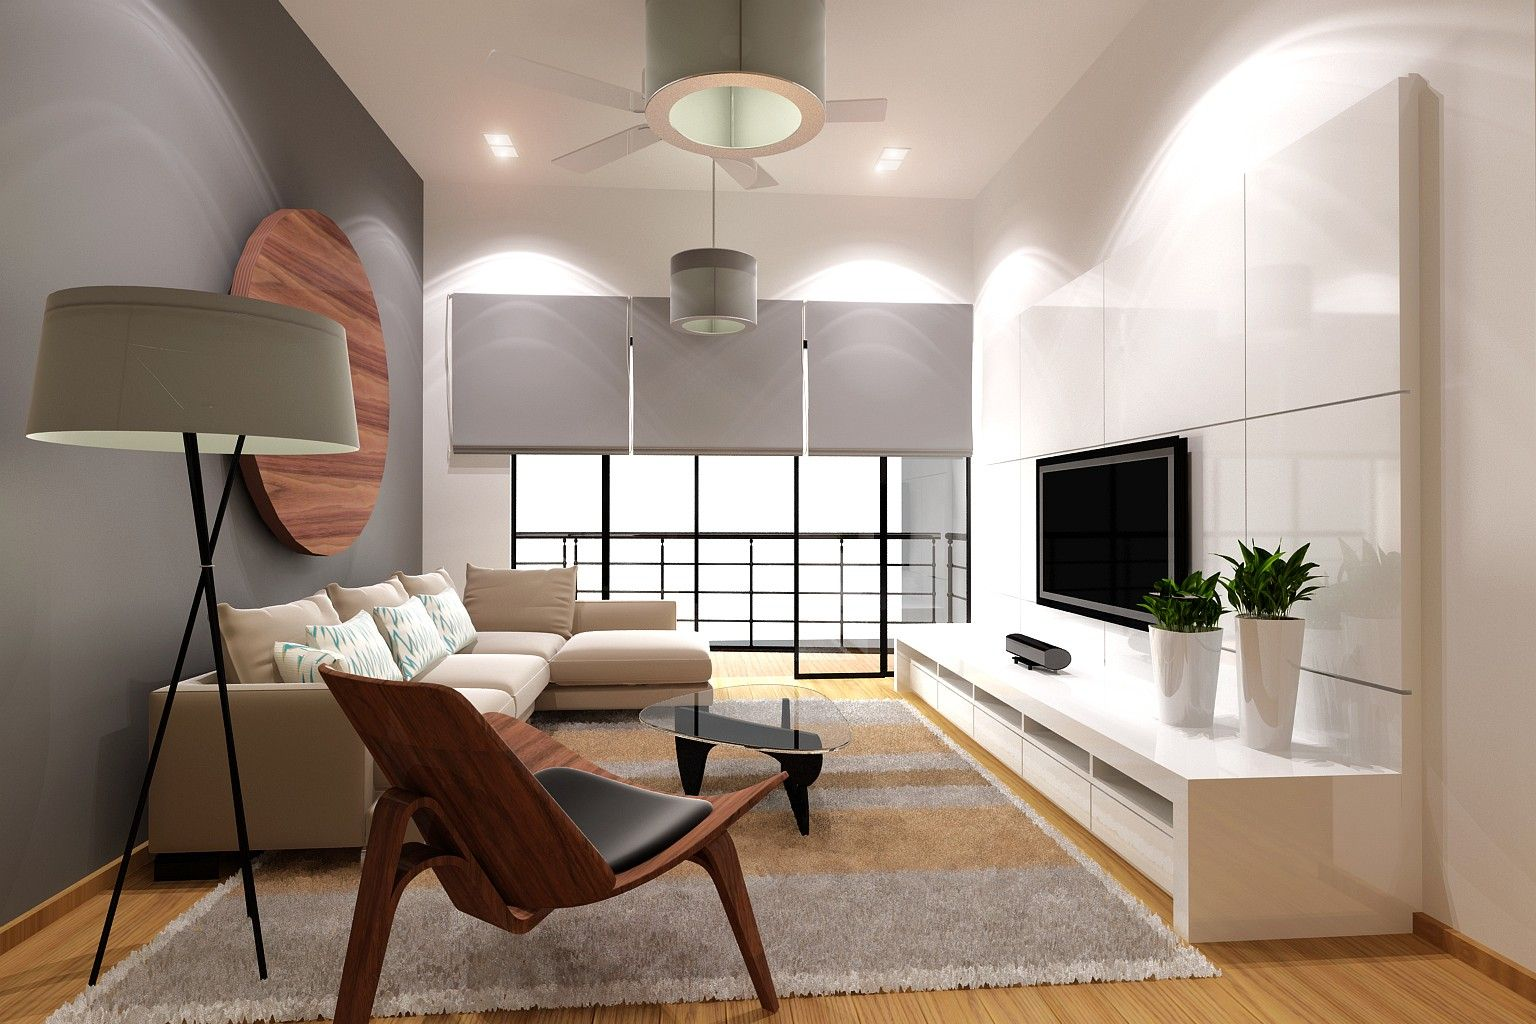 Enchanting Home Design Minimalist Also Condo Living Room Ideas Also Modern Lounge Decor Ideas Modern Condo Living Room Condo Living Room Condo Interior Design Condo living room idea